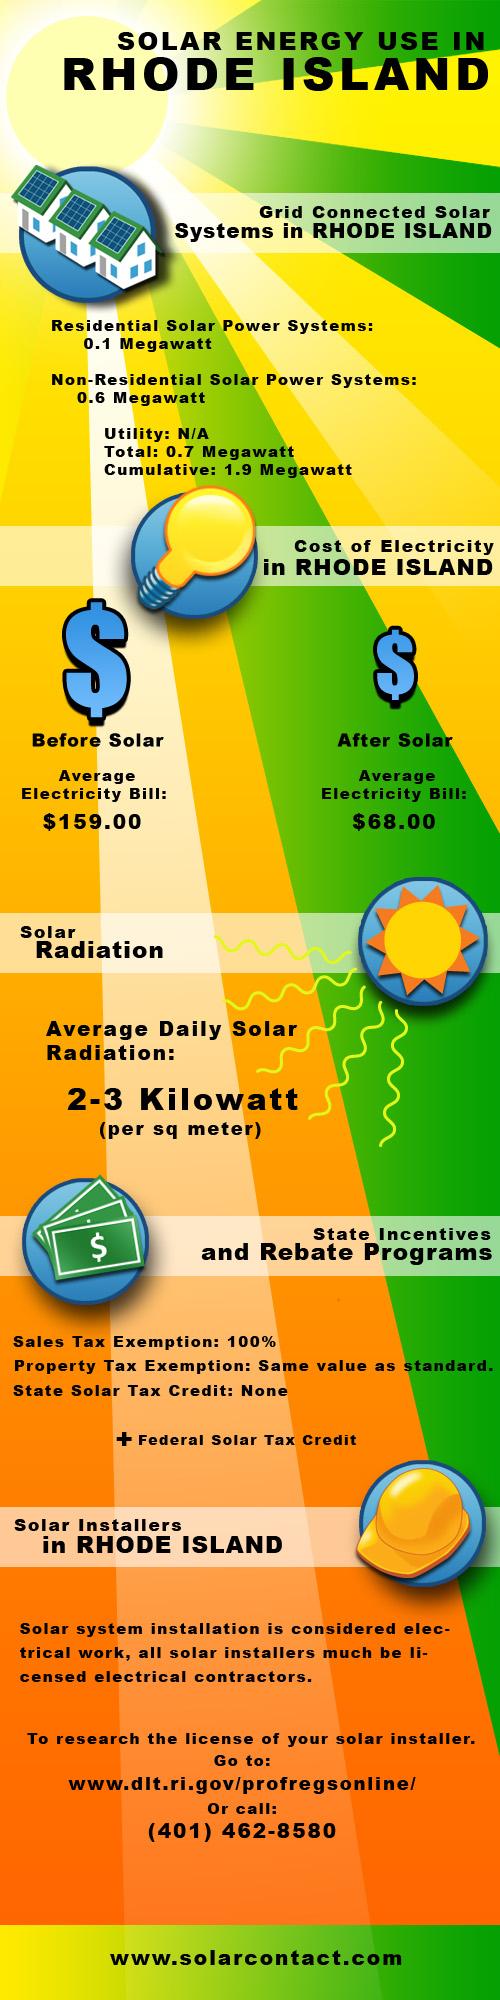 Fact Sheet Solar Energy Use in Rhode Island